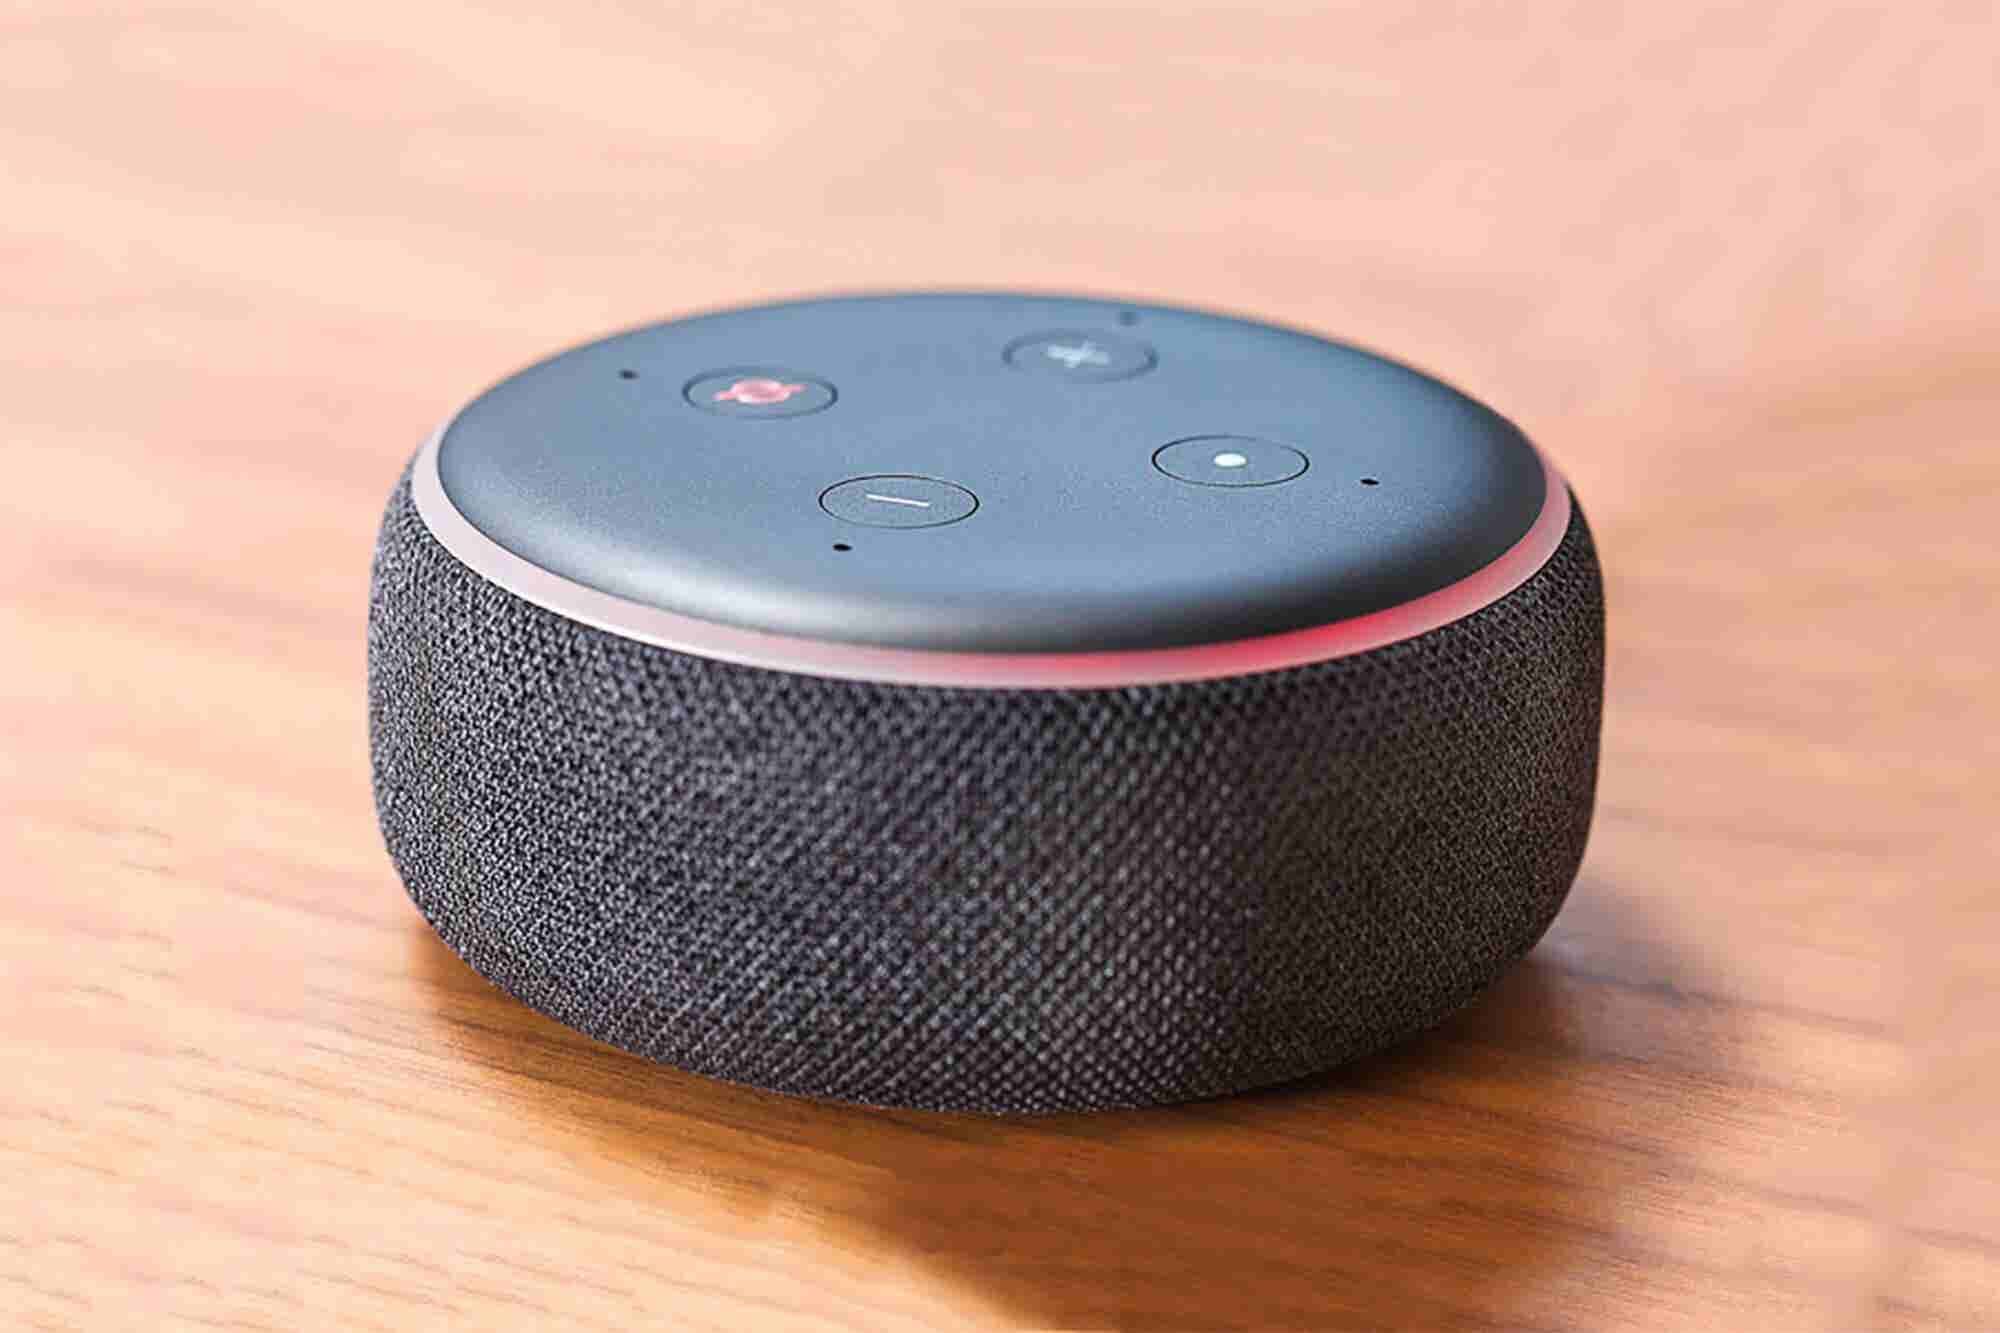 Amazon Blames Human Error for Sharing 1,700 Alexa Audio Files